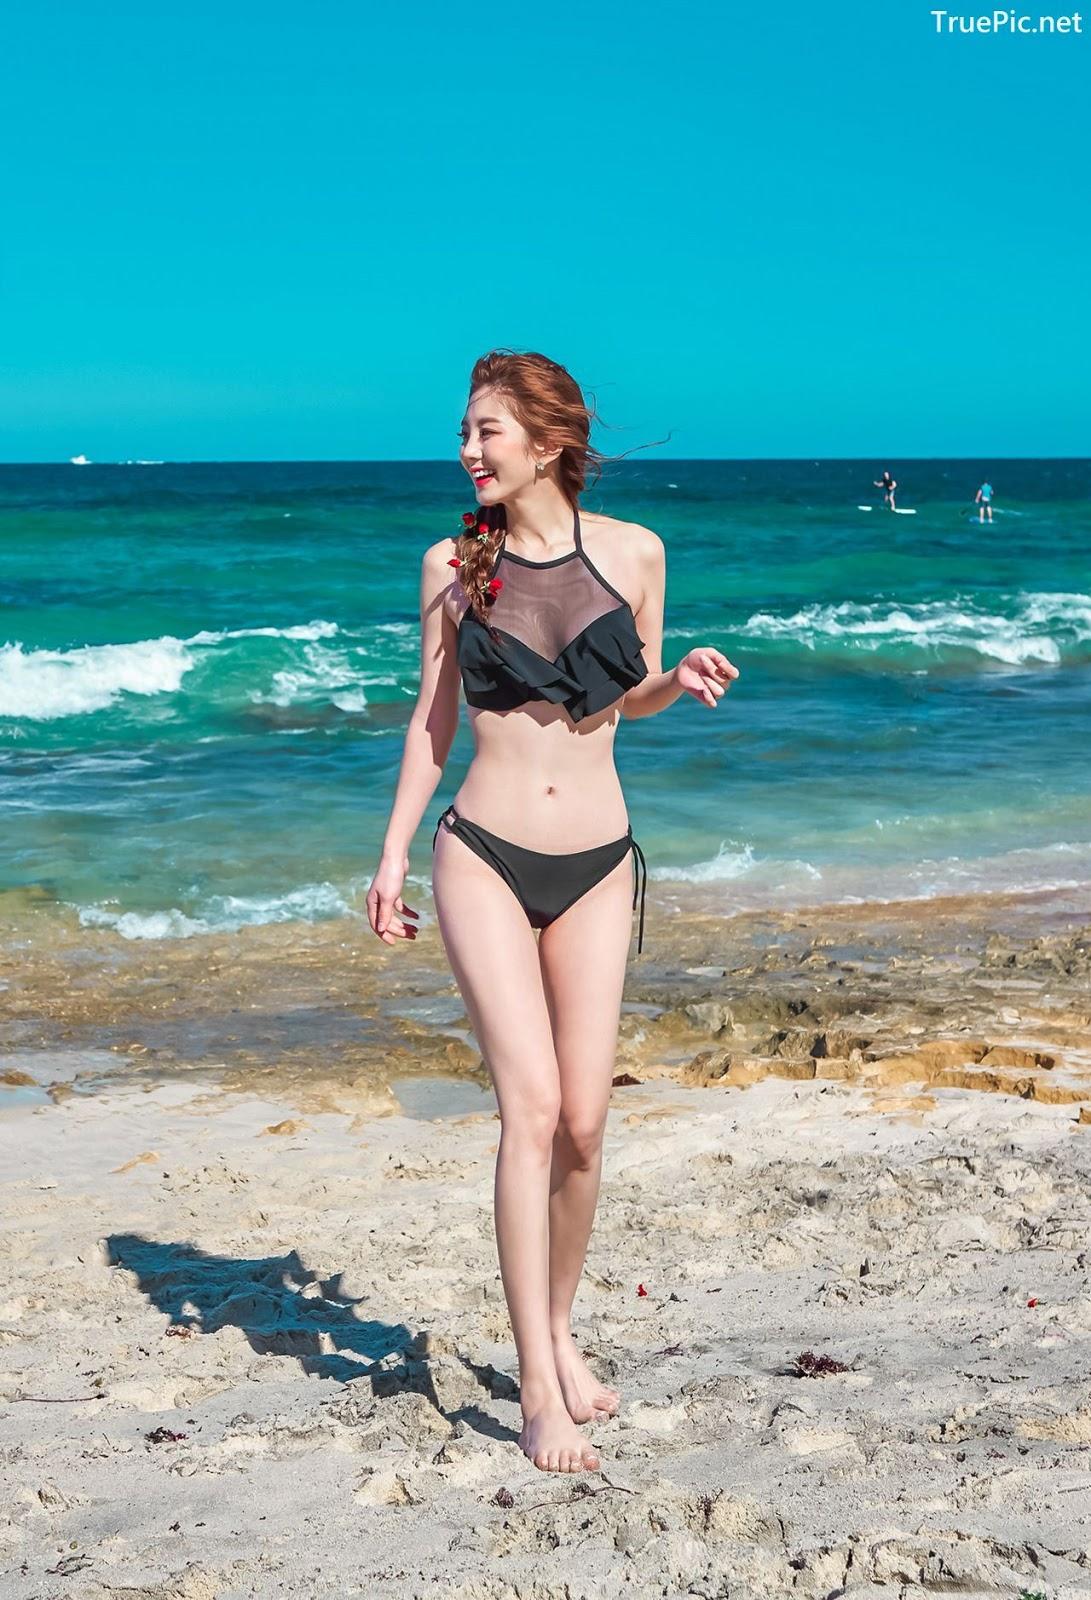 Image-Korean-Hot-Fashion-Model-Lee-Chae-Eun-Beachwear-Set-Collection-TruePic.net- Picture-6